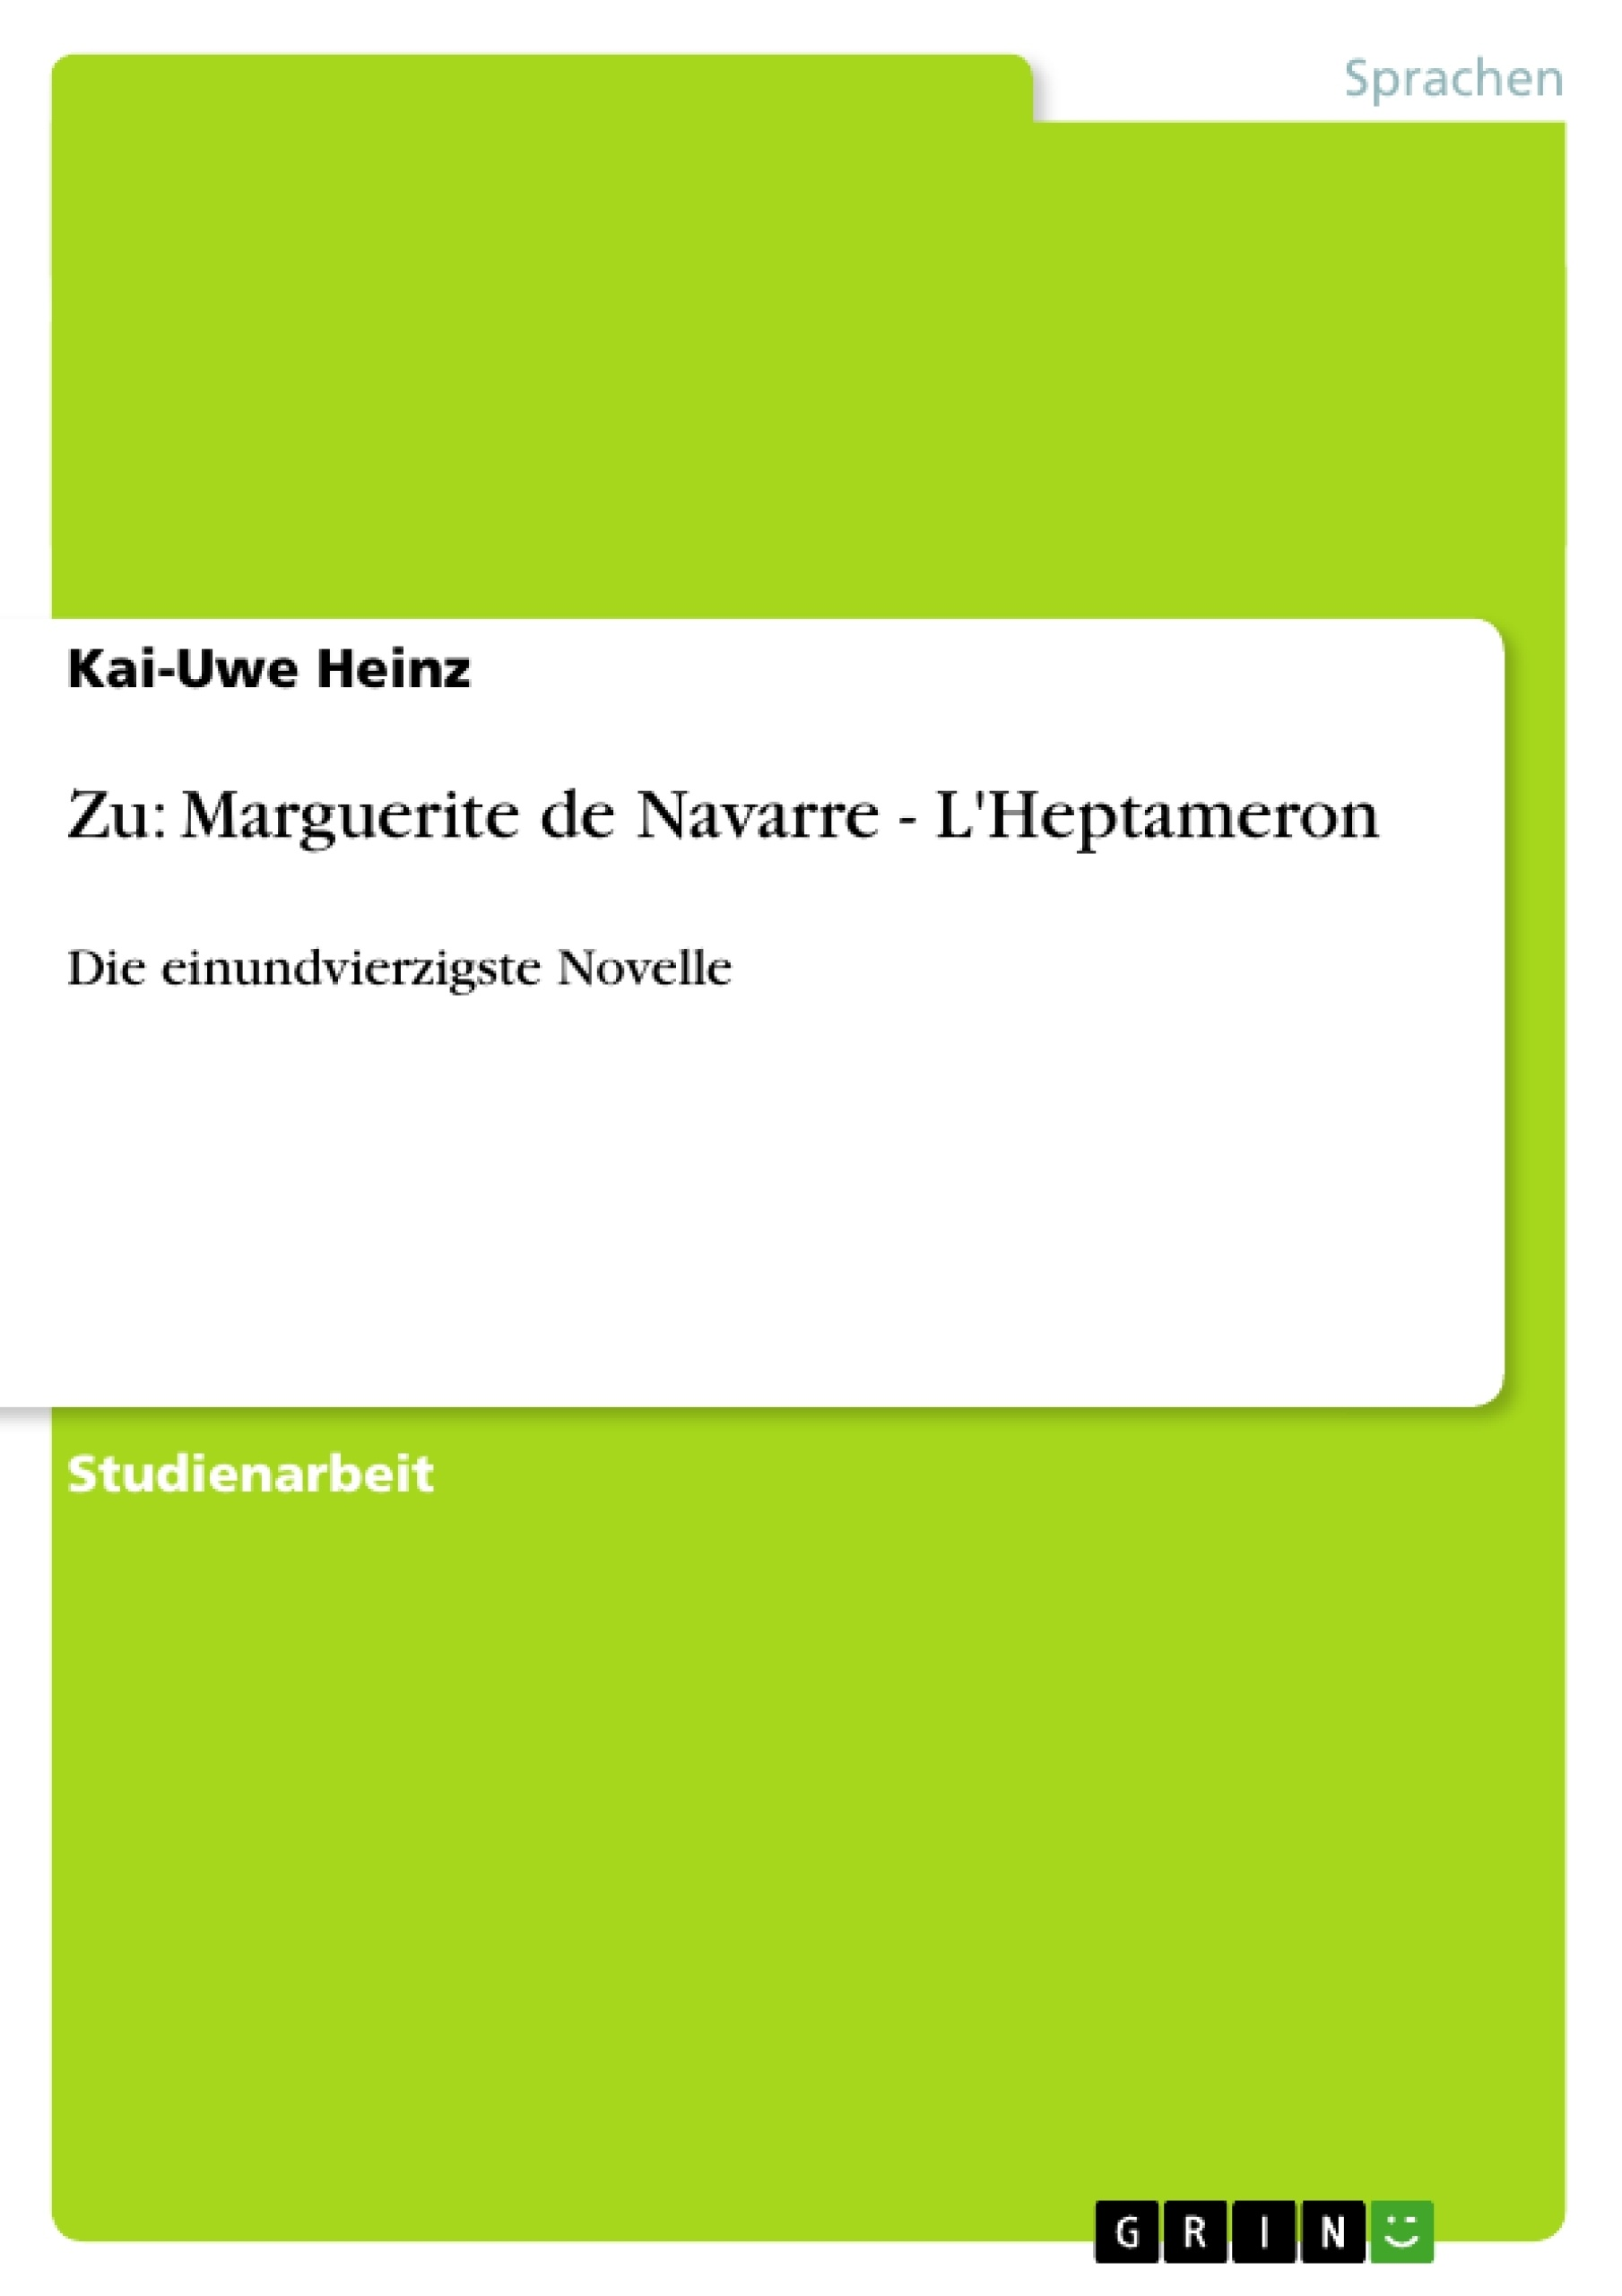 Titel: Zu: Marguerite de Navarre - L'Heptameron